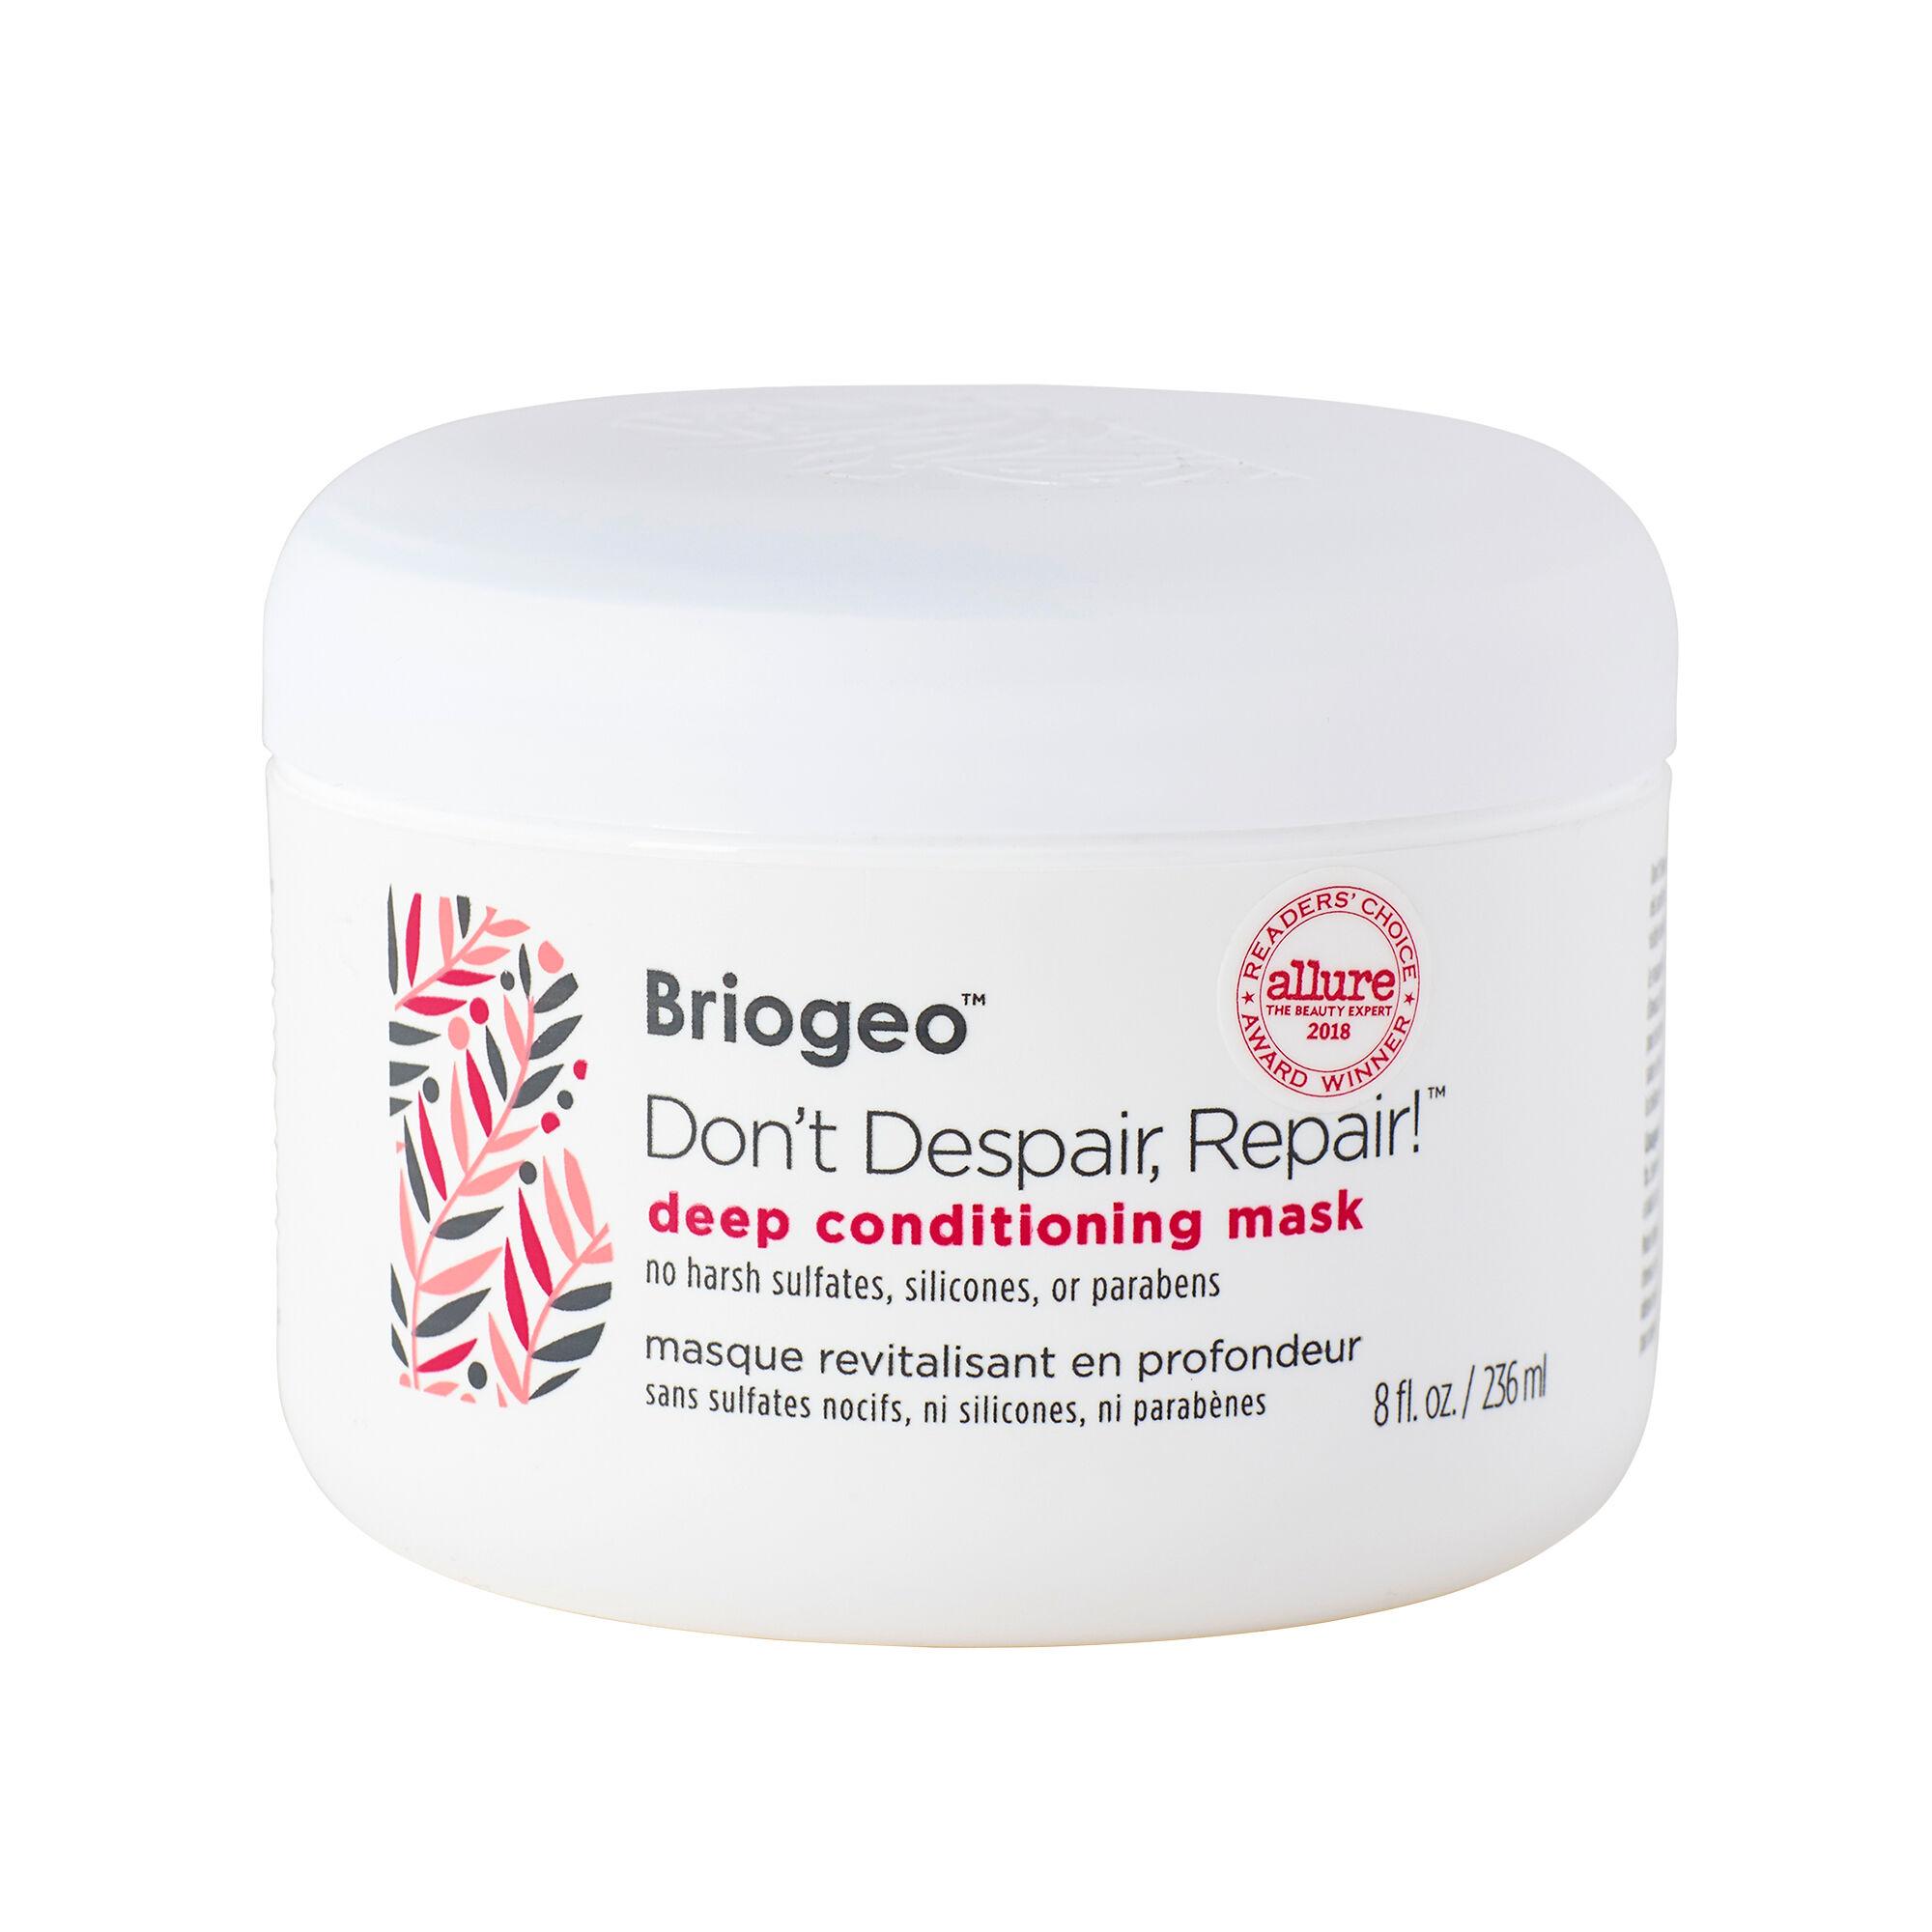 Briogeo Masque revitalisant en profondeur Don't Despair; Repair! 236ml